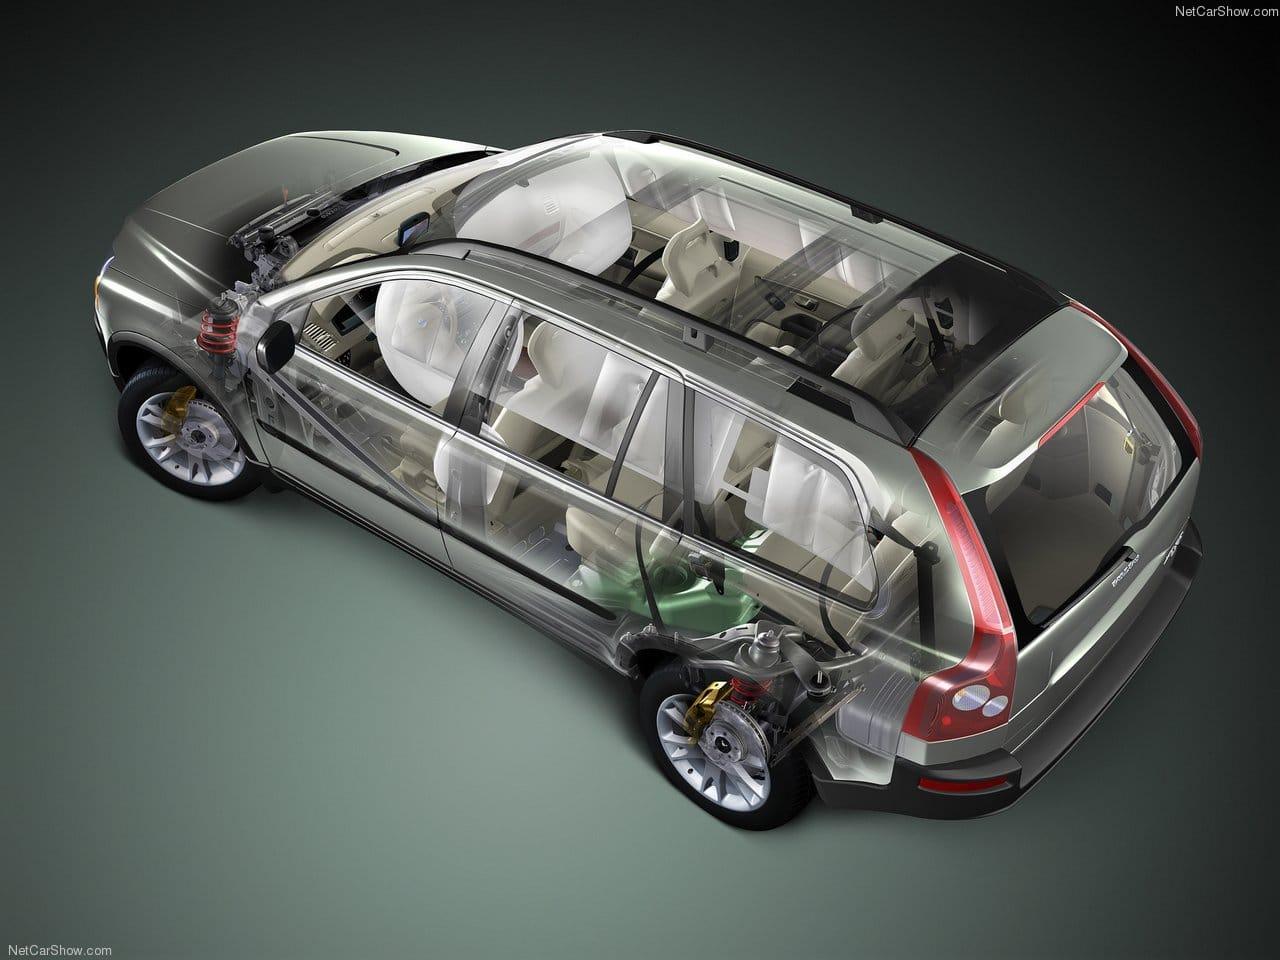 Volvo XC90, Volvo, XC90, suv, Sweden, 4x4, motoring, automotive, car, cars, classic car, retro car, cheap car, autotrader, ebay motors